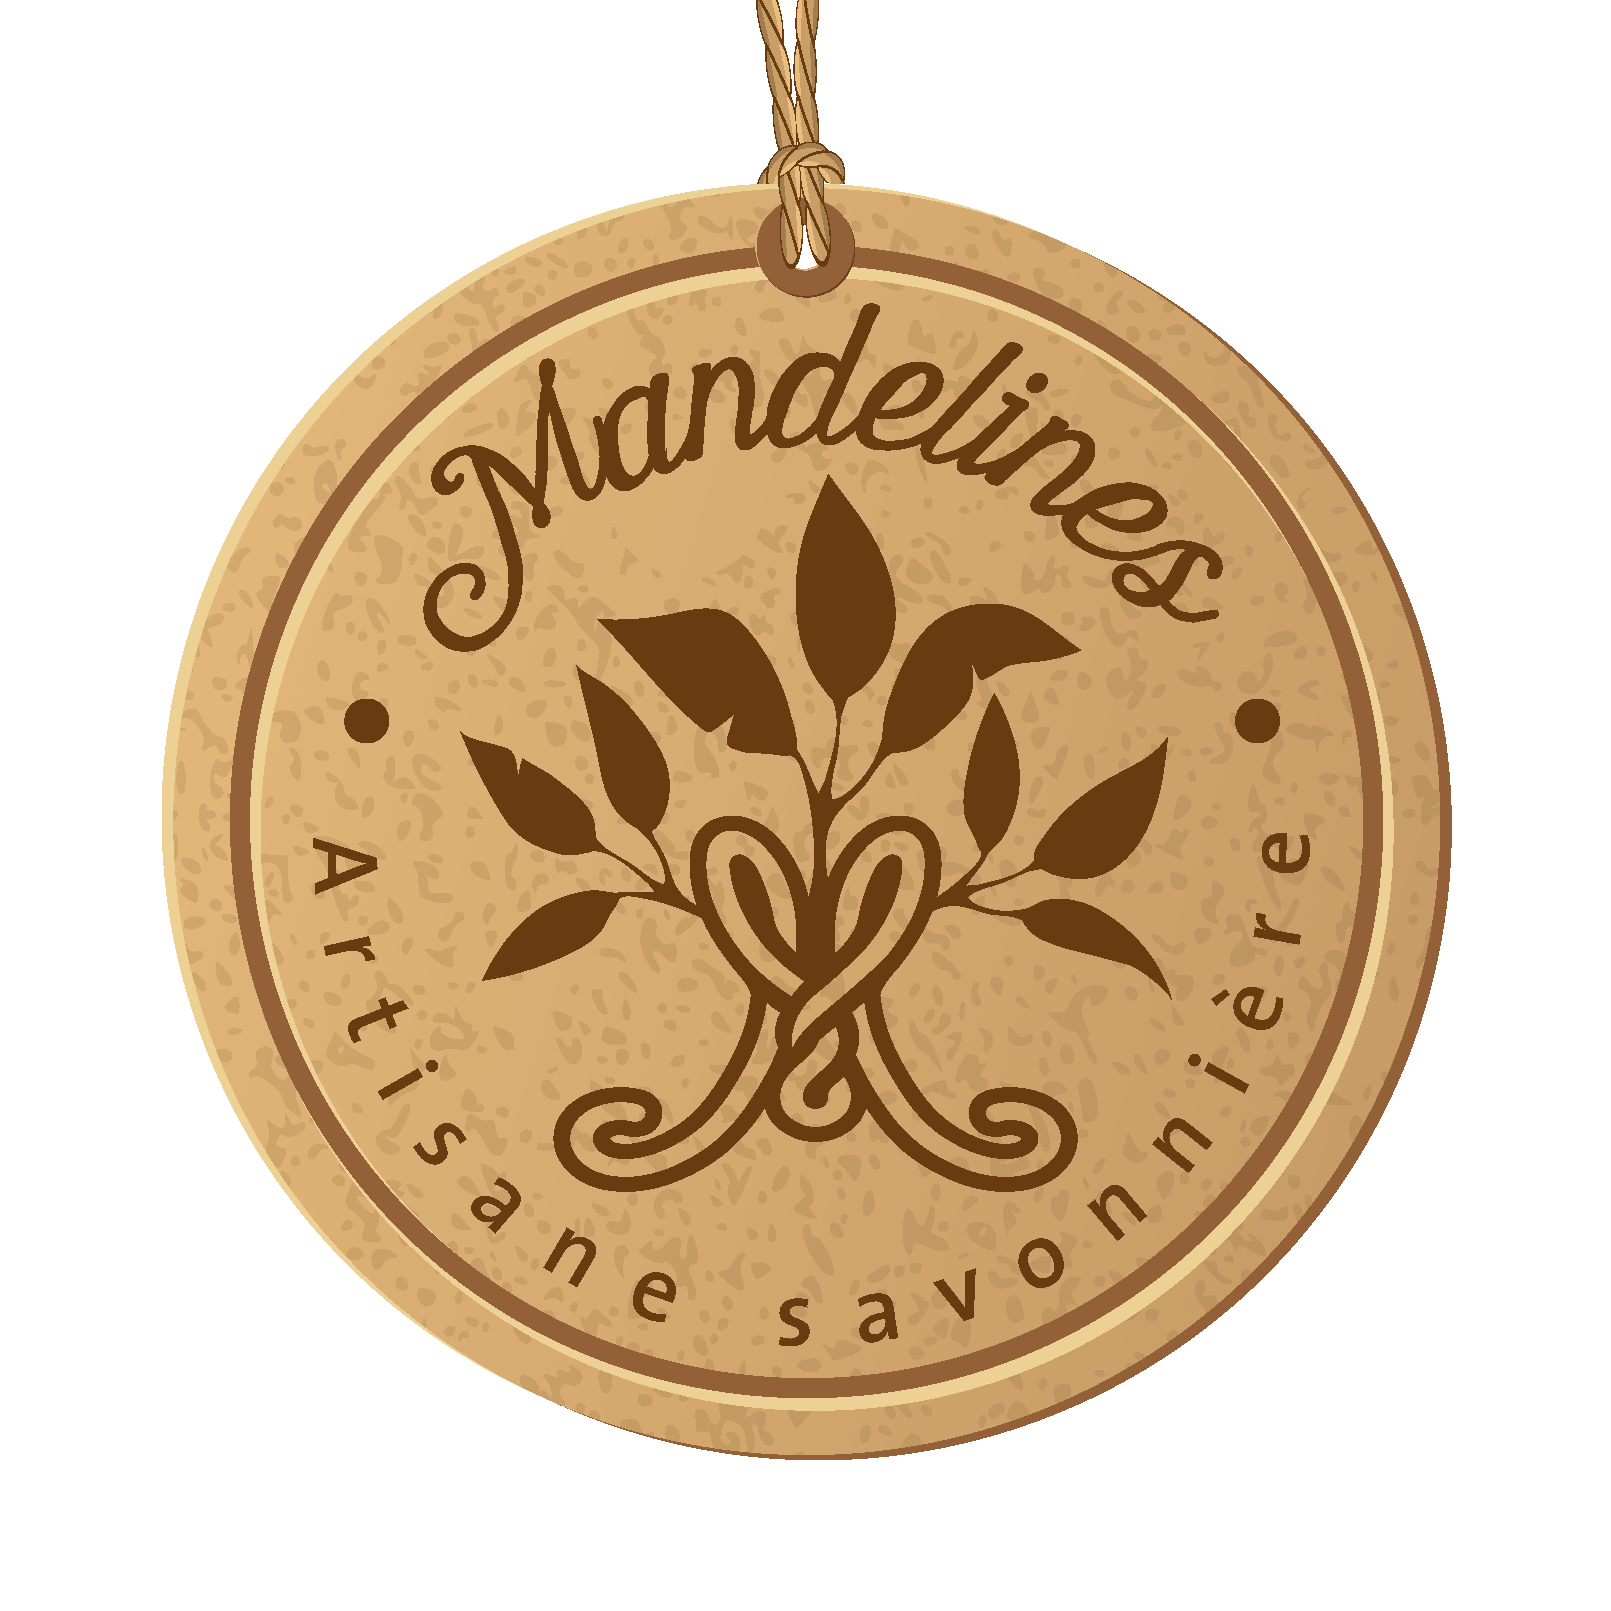 Mandelines